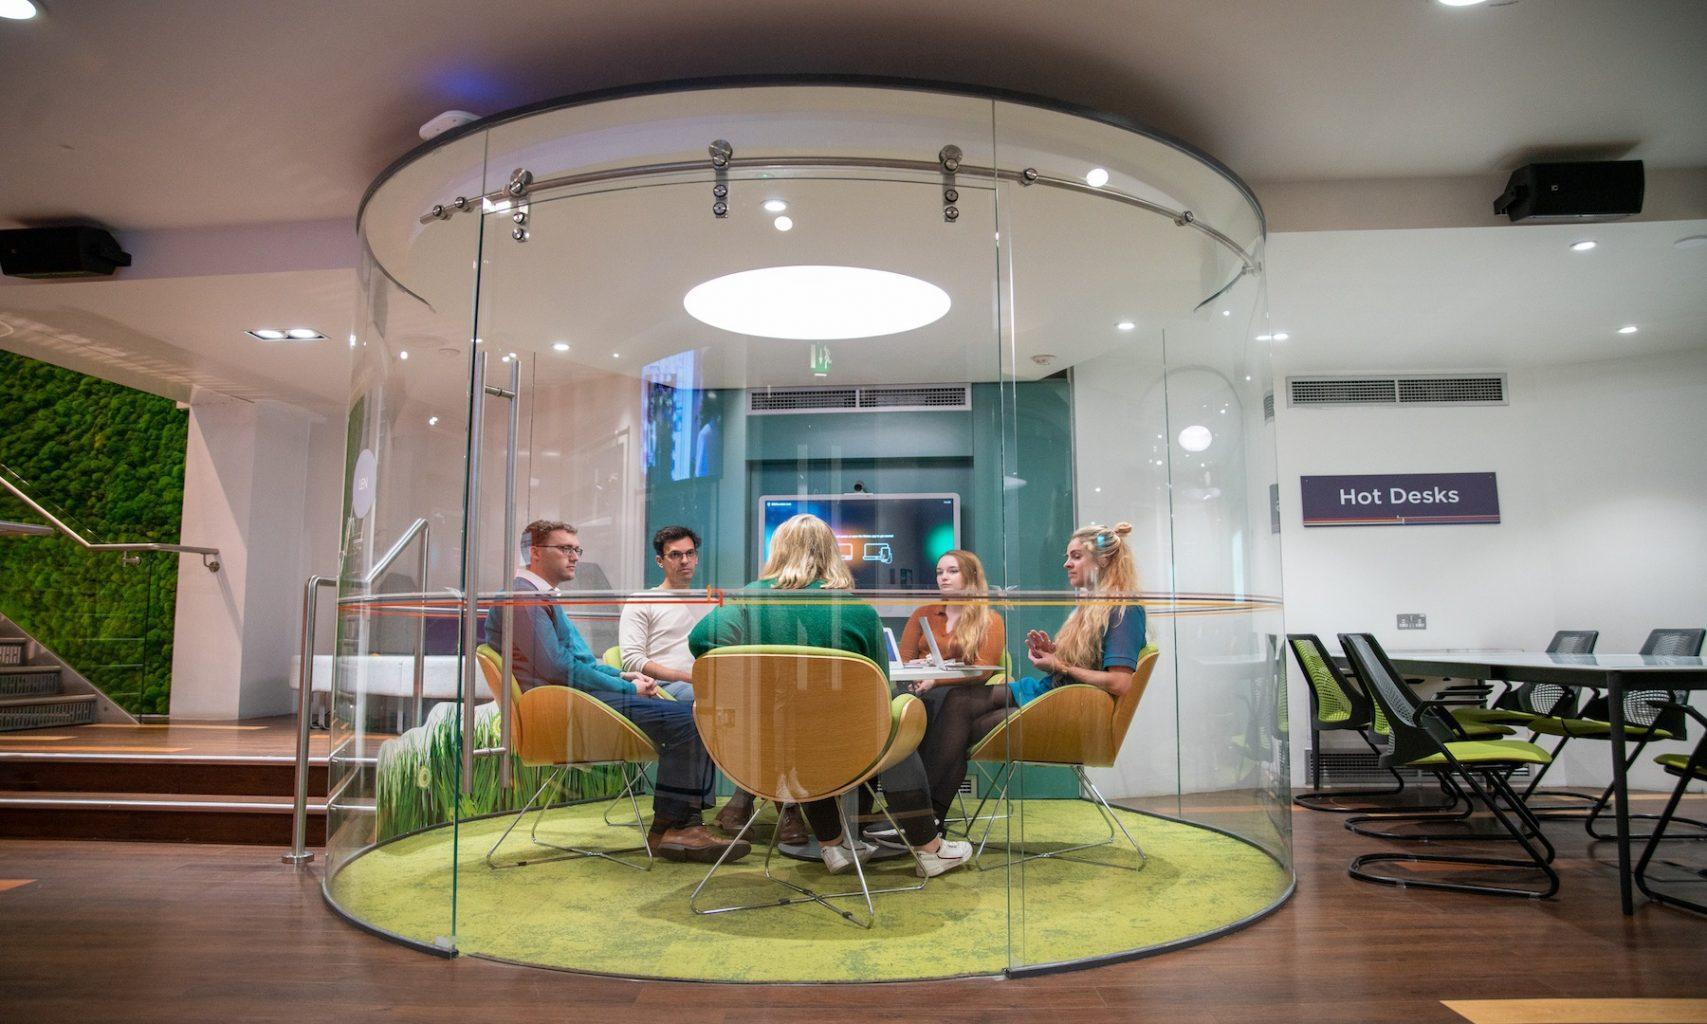 idea london-101043